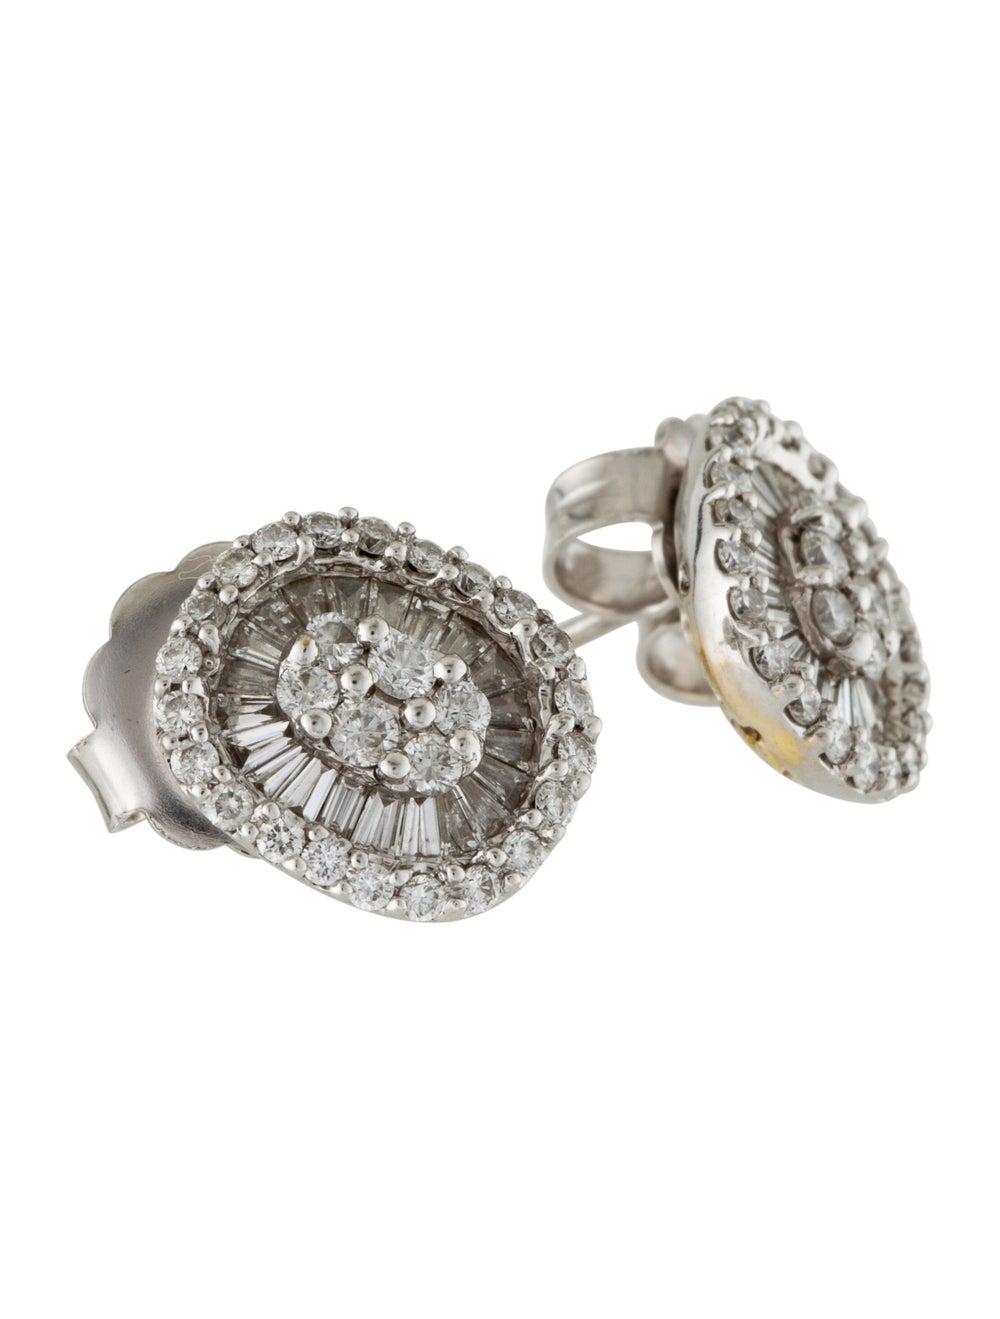 Diamond Stud Earrings White - image 3